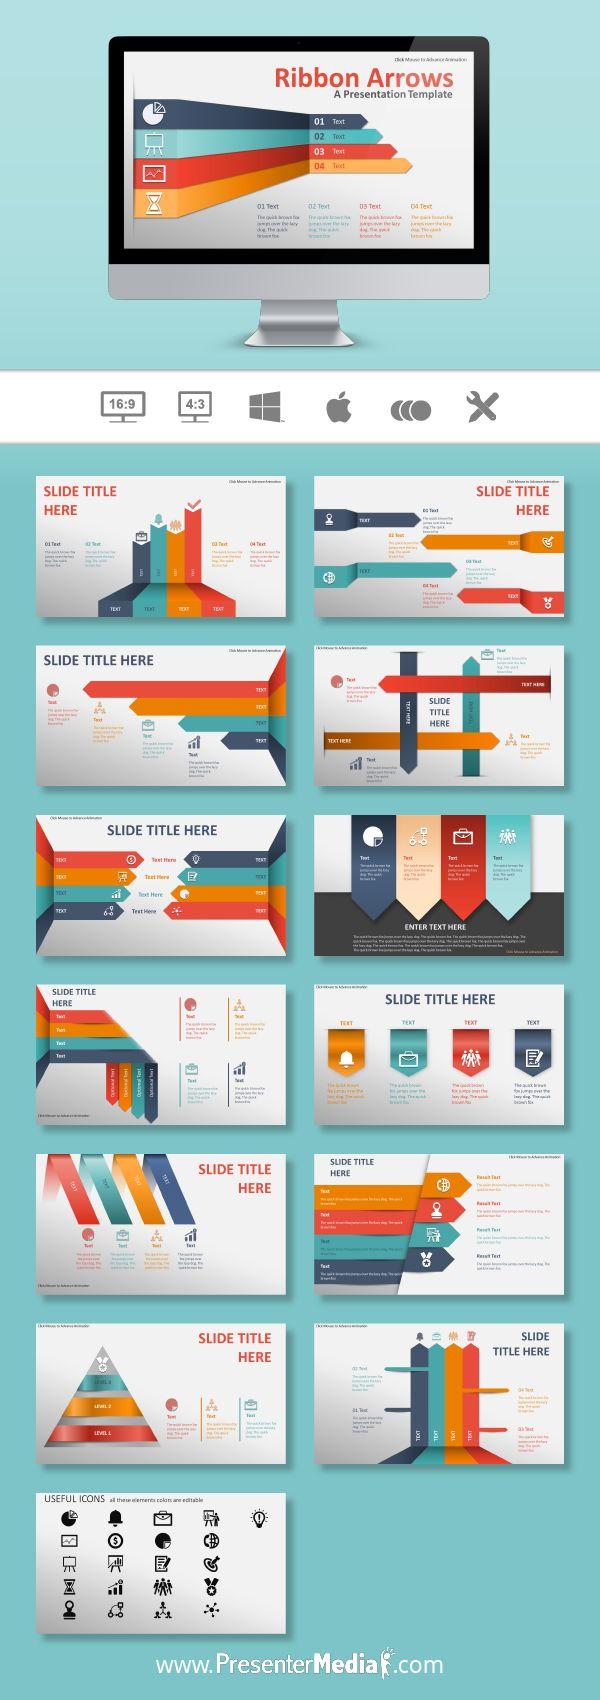 Ribbon Arrows Template #PowerPoint #Keynote http://bit.ly/2blZk6J